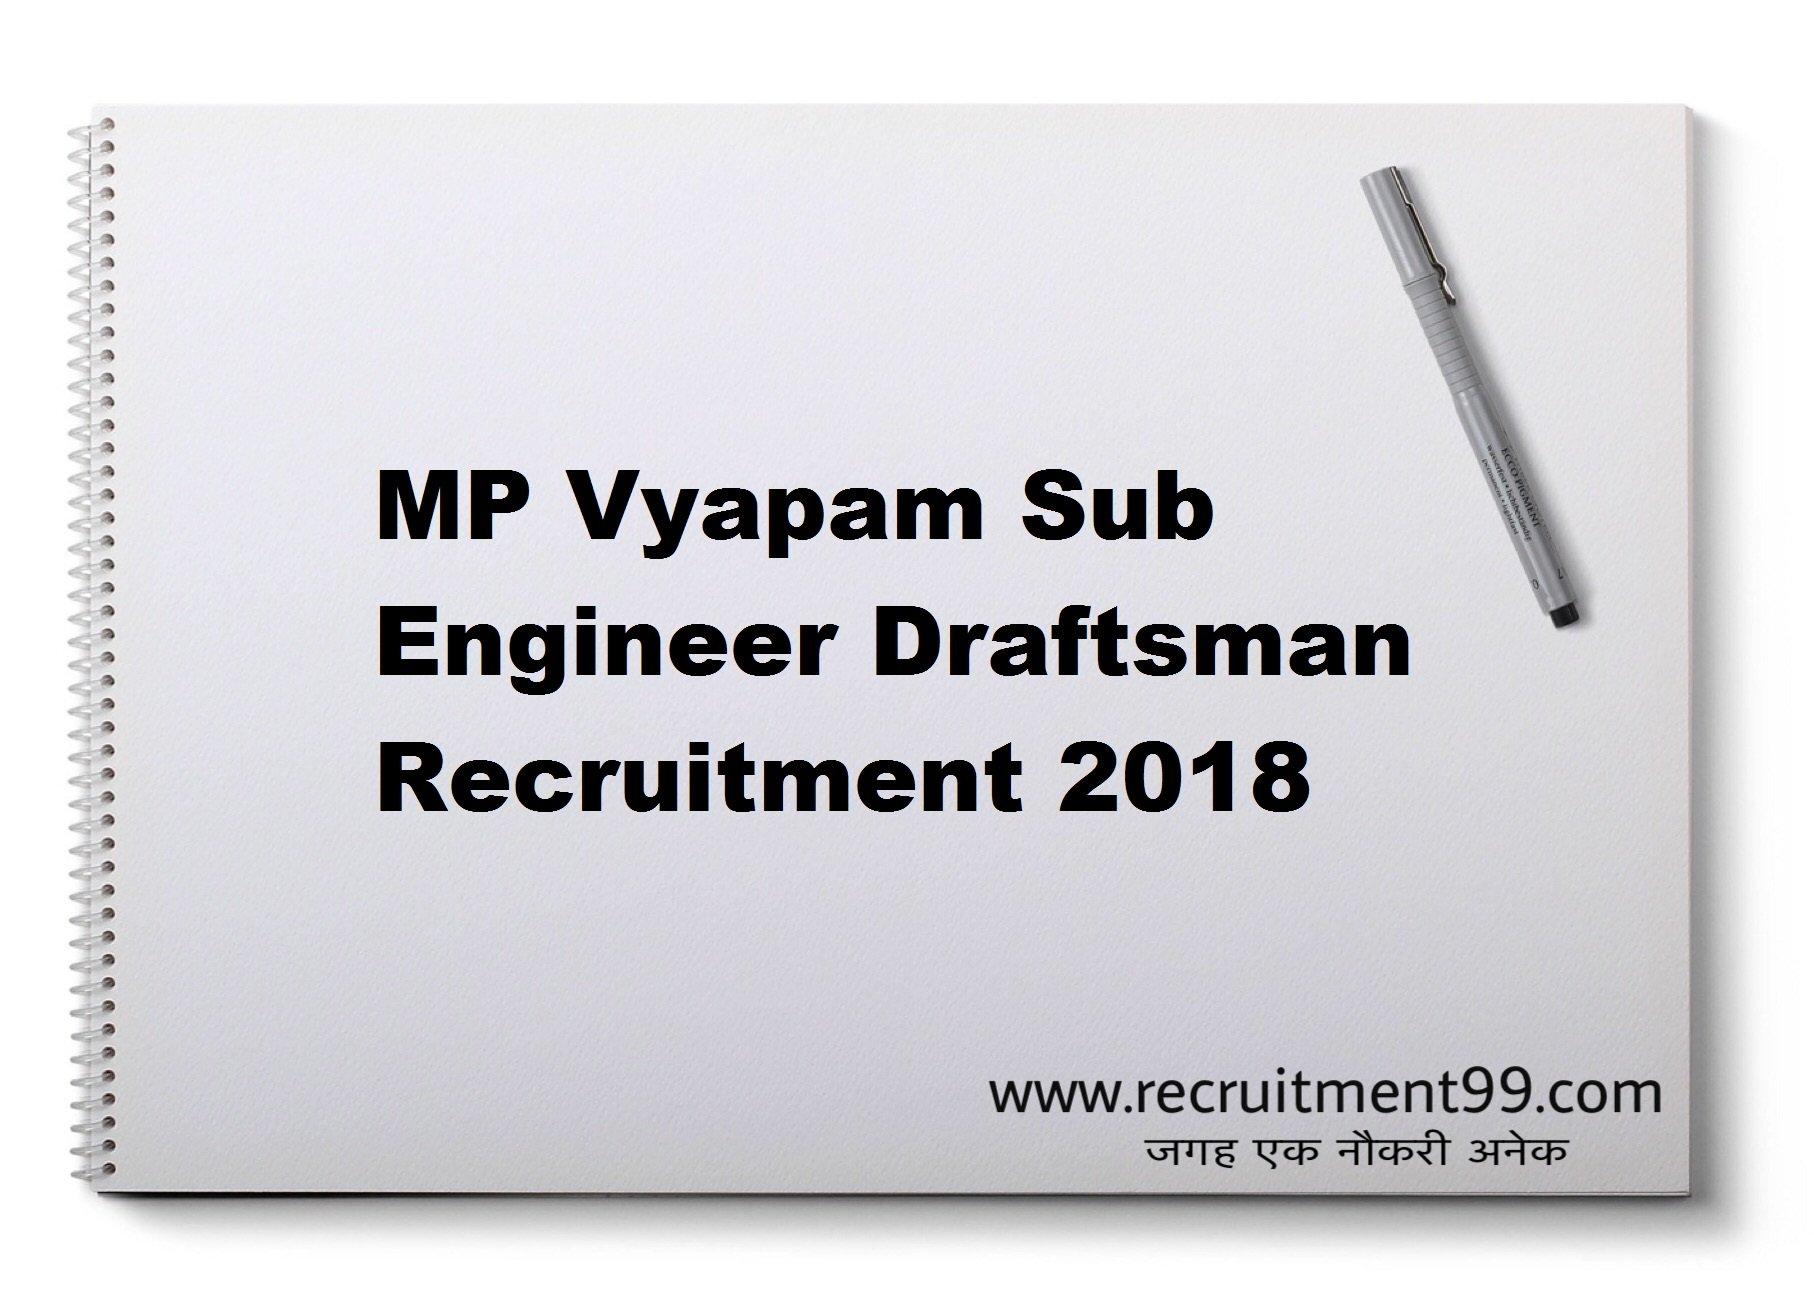 MP Vyapam Sub Engineer Draftsman Recruitment Admit Card Result 2018